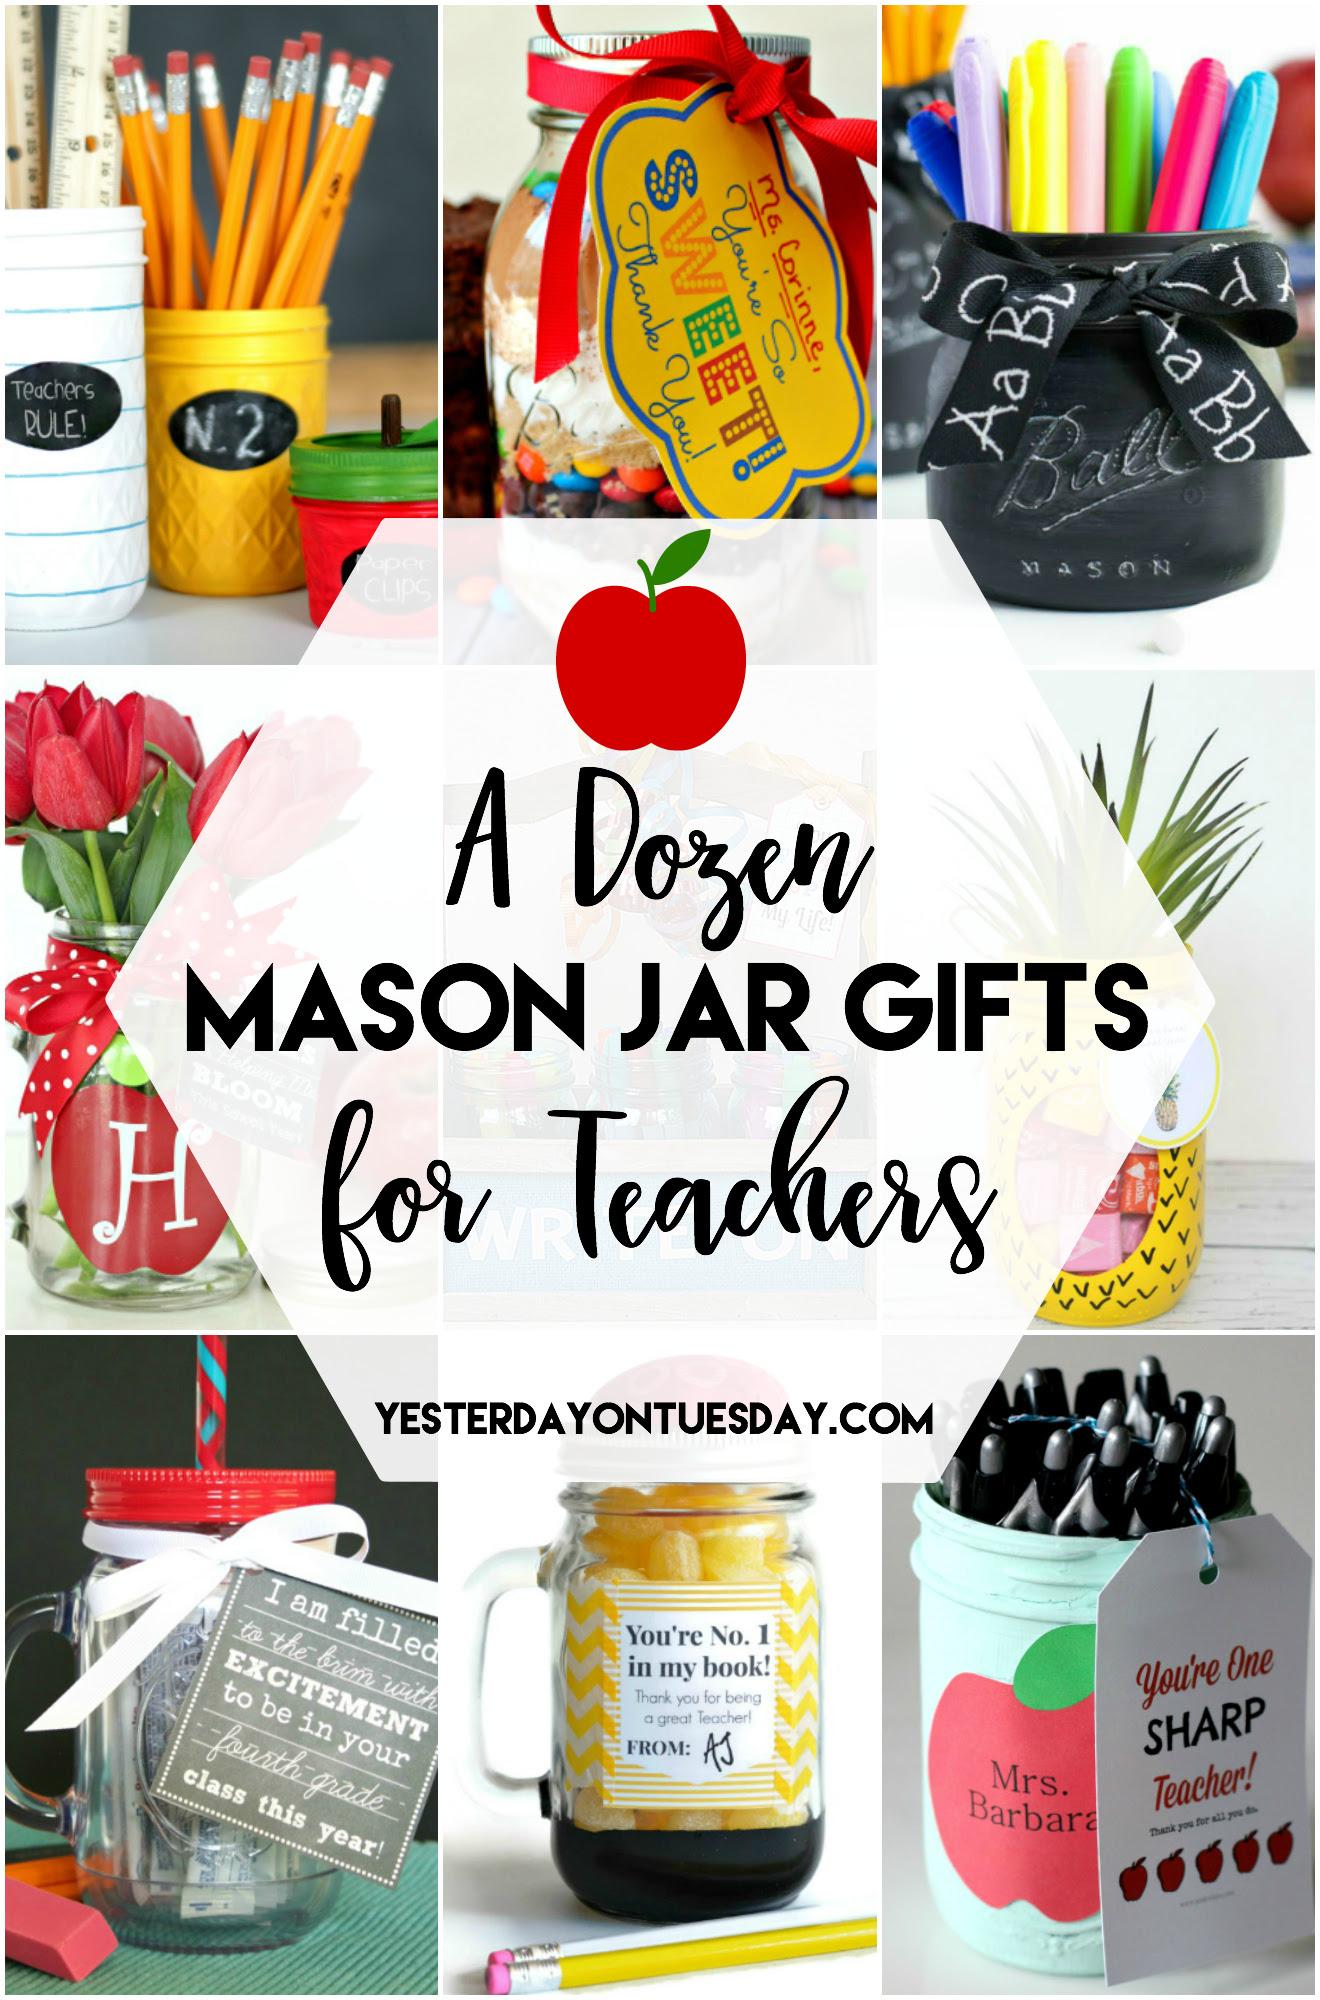 A Dozen Mason Jar Gifts for Teachers | Yesterday On Tuesday